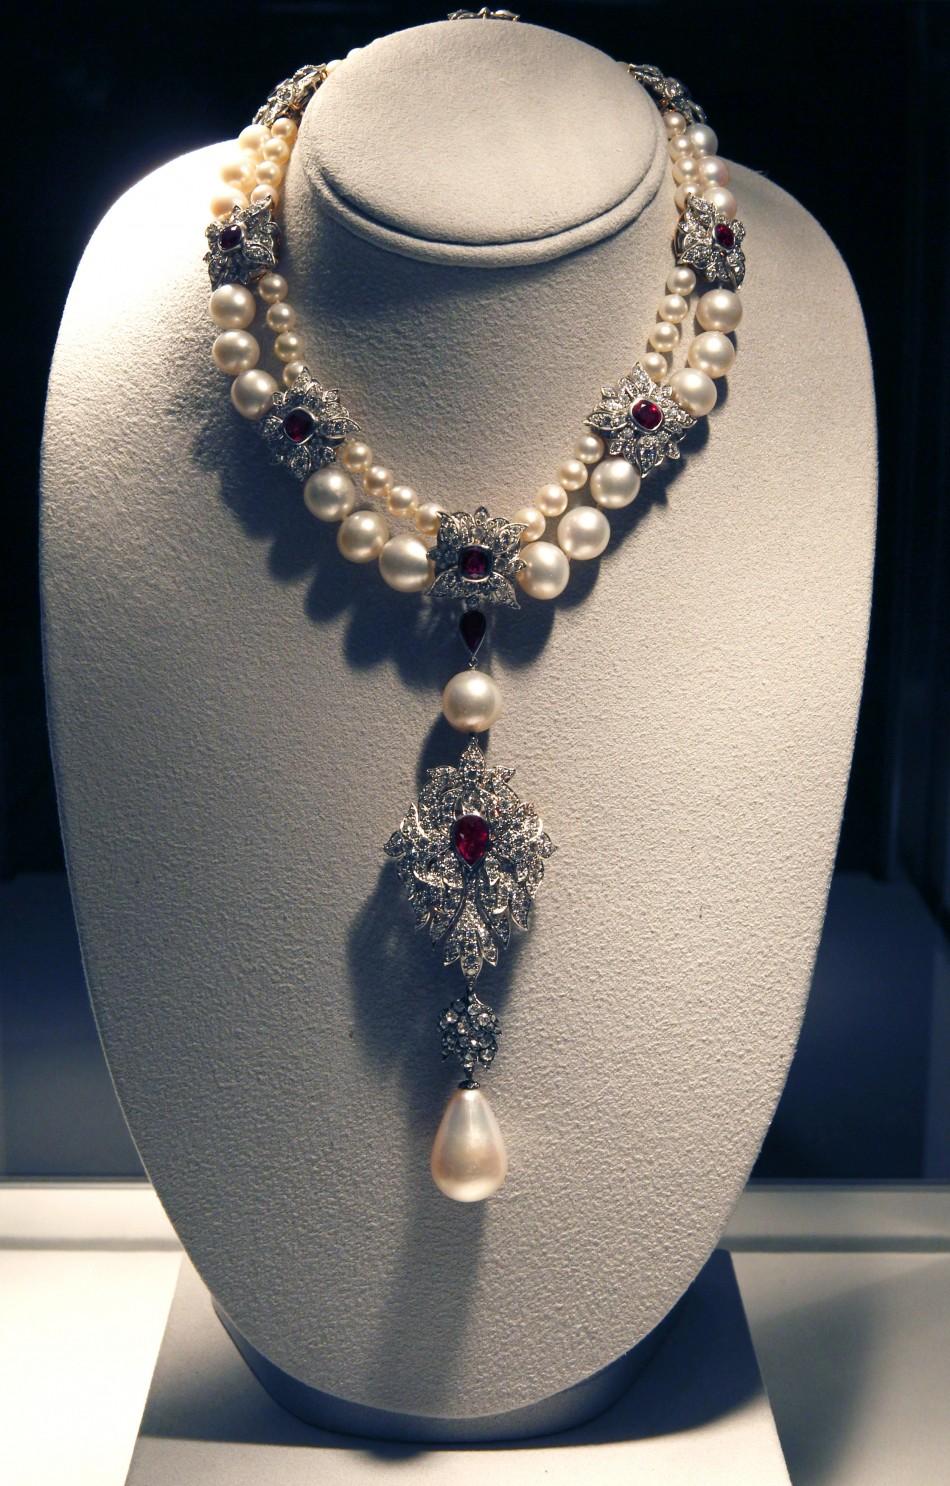 The legendary 16th century pearl, La Peregrina